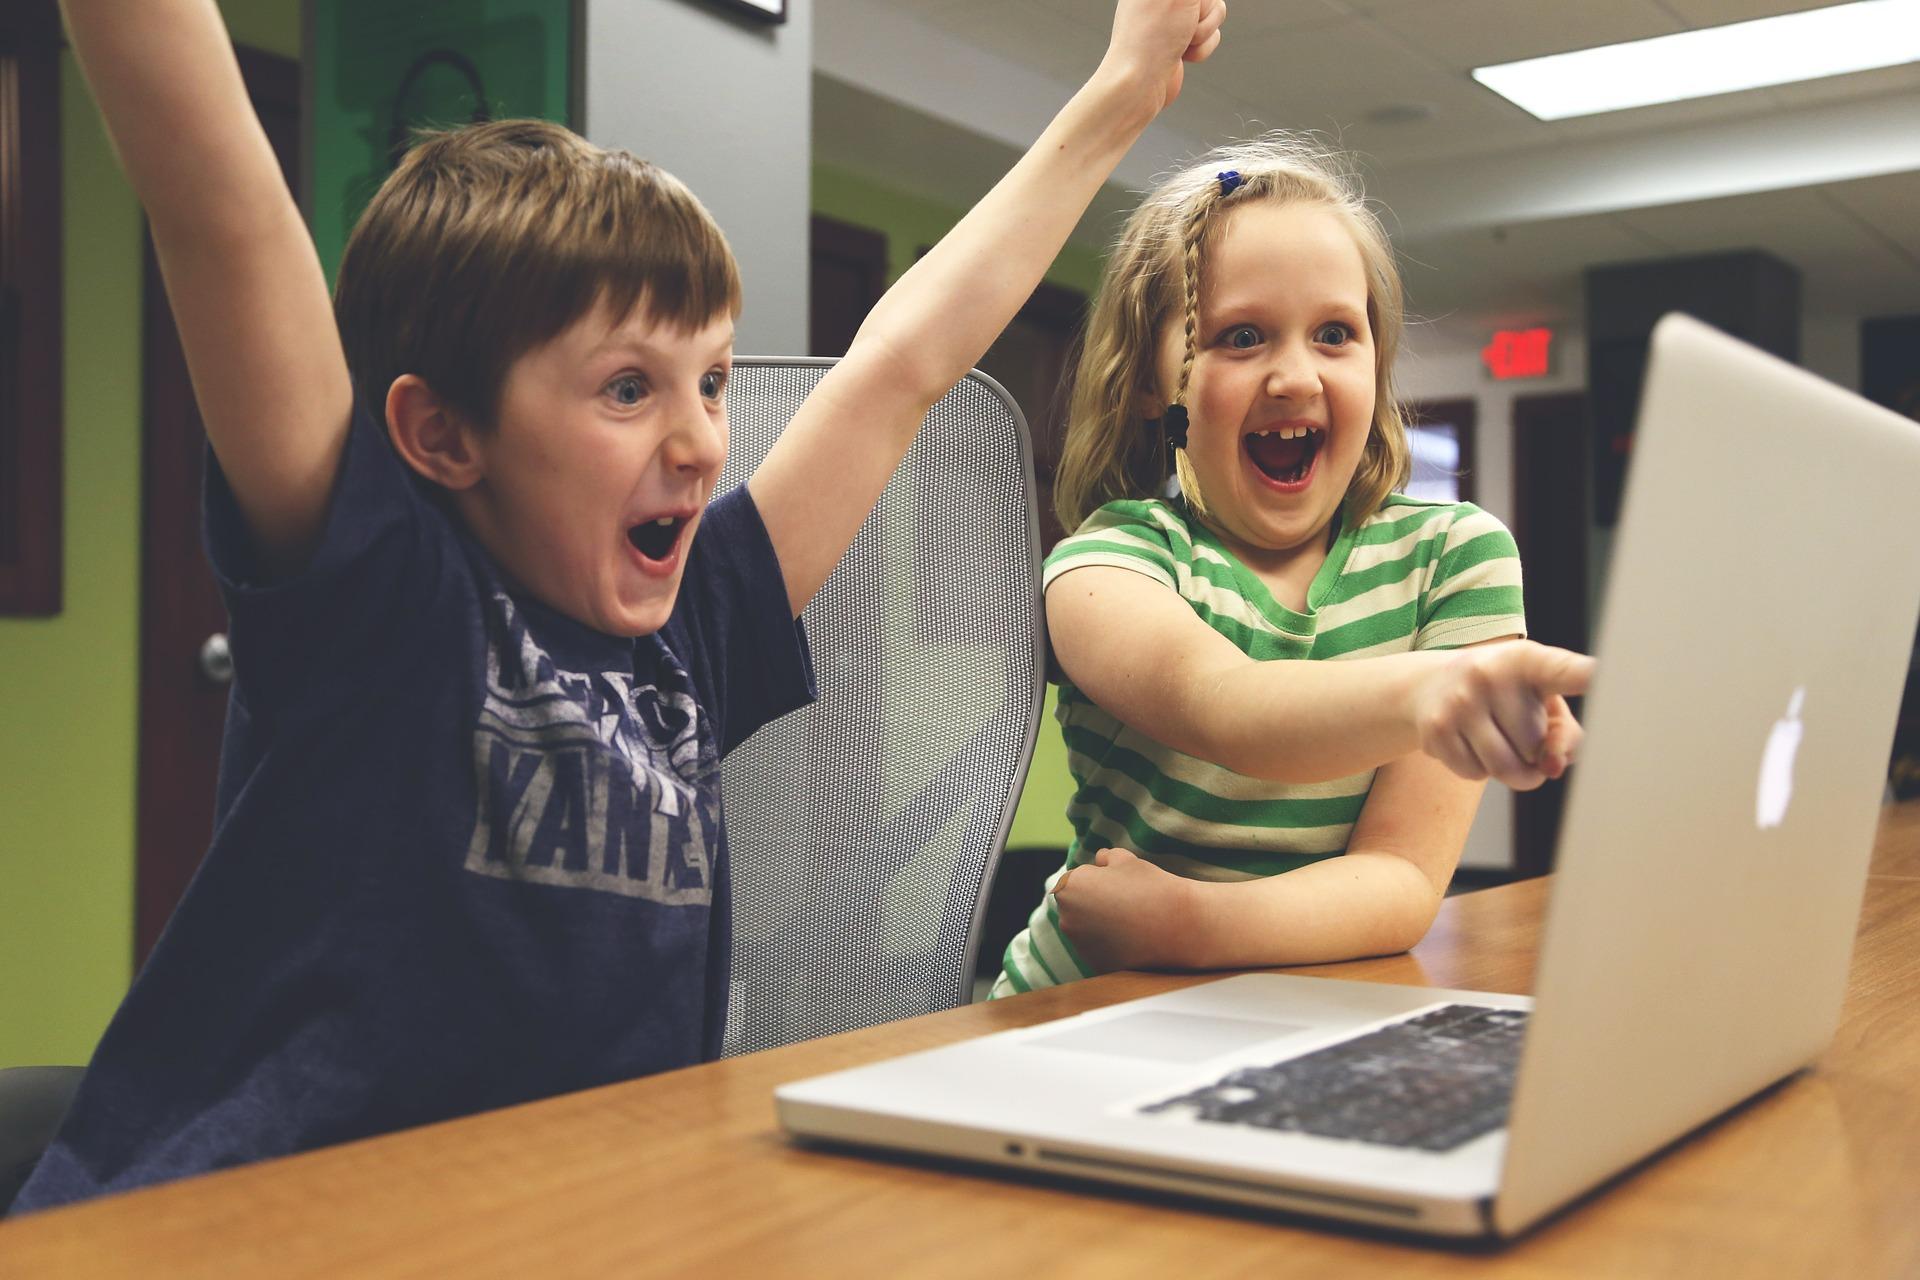 What Makes a Good Website? 5 Core Principles